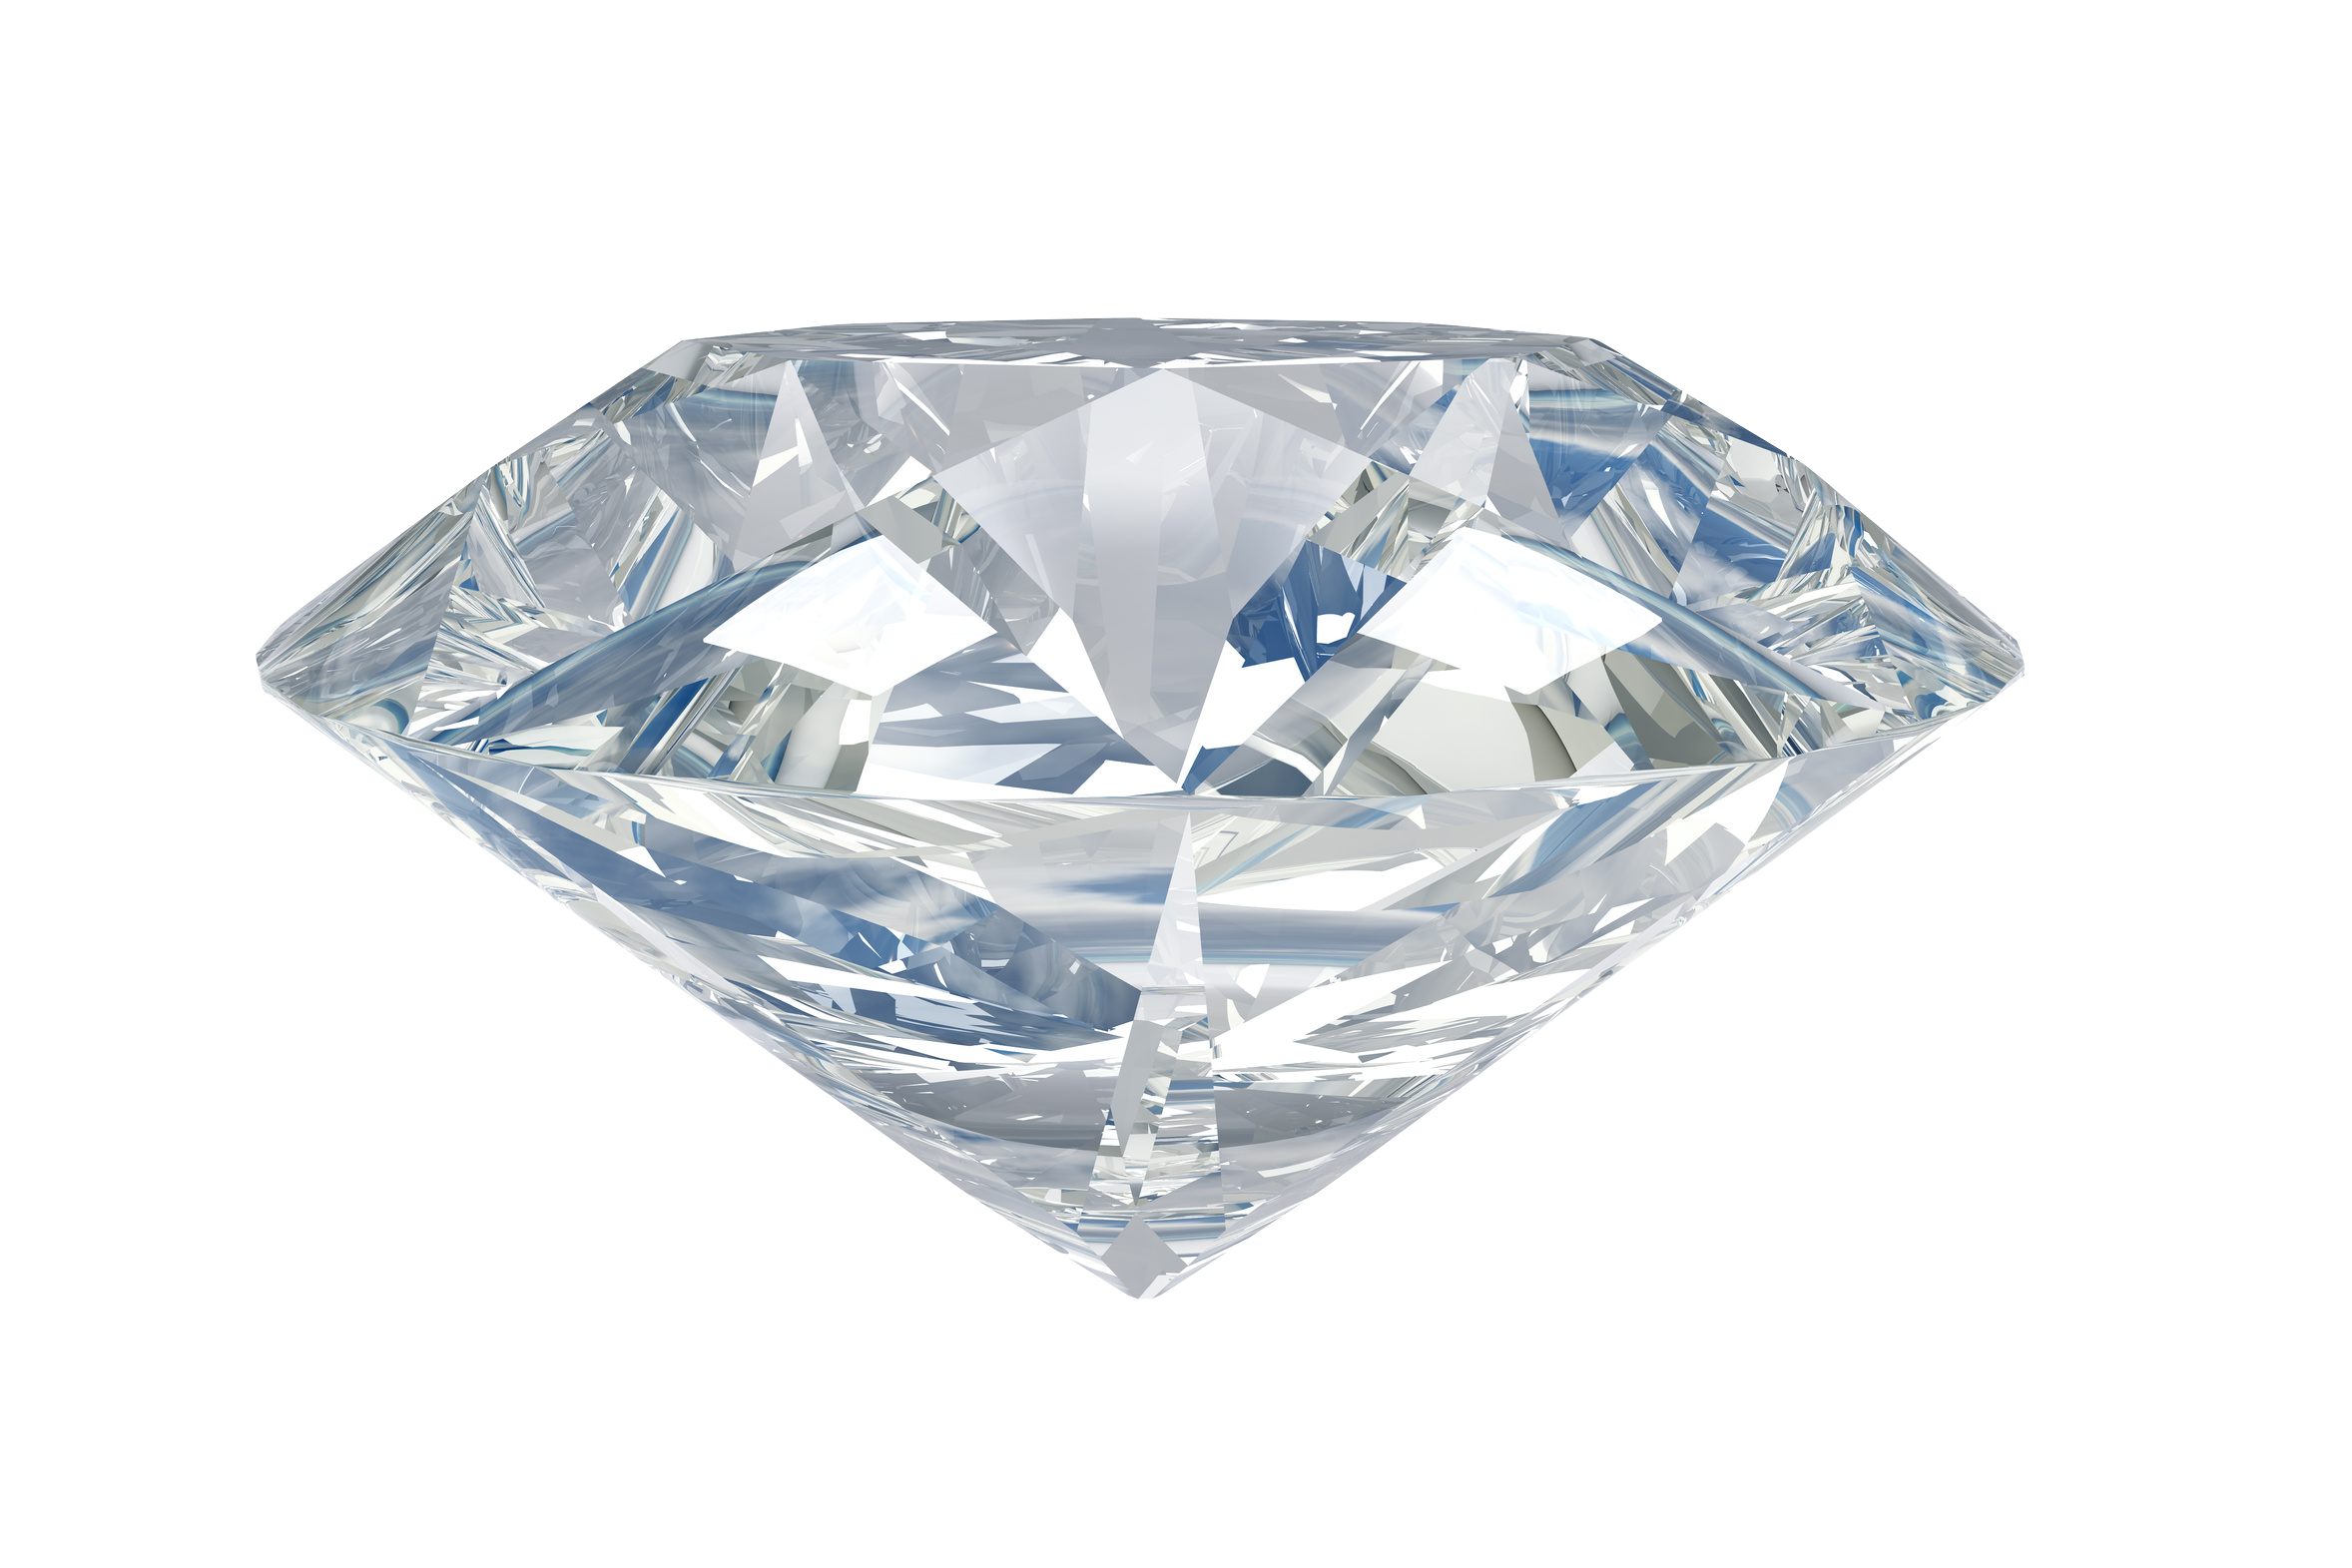 Diamond HD PNG - 120183